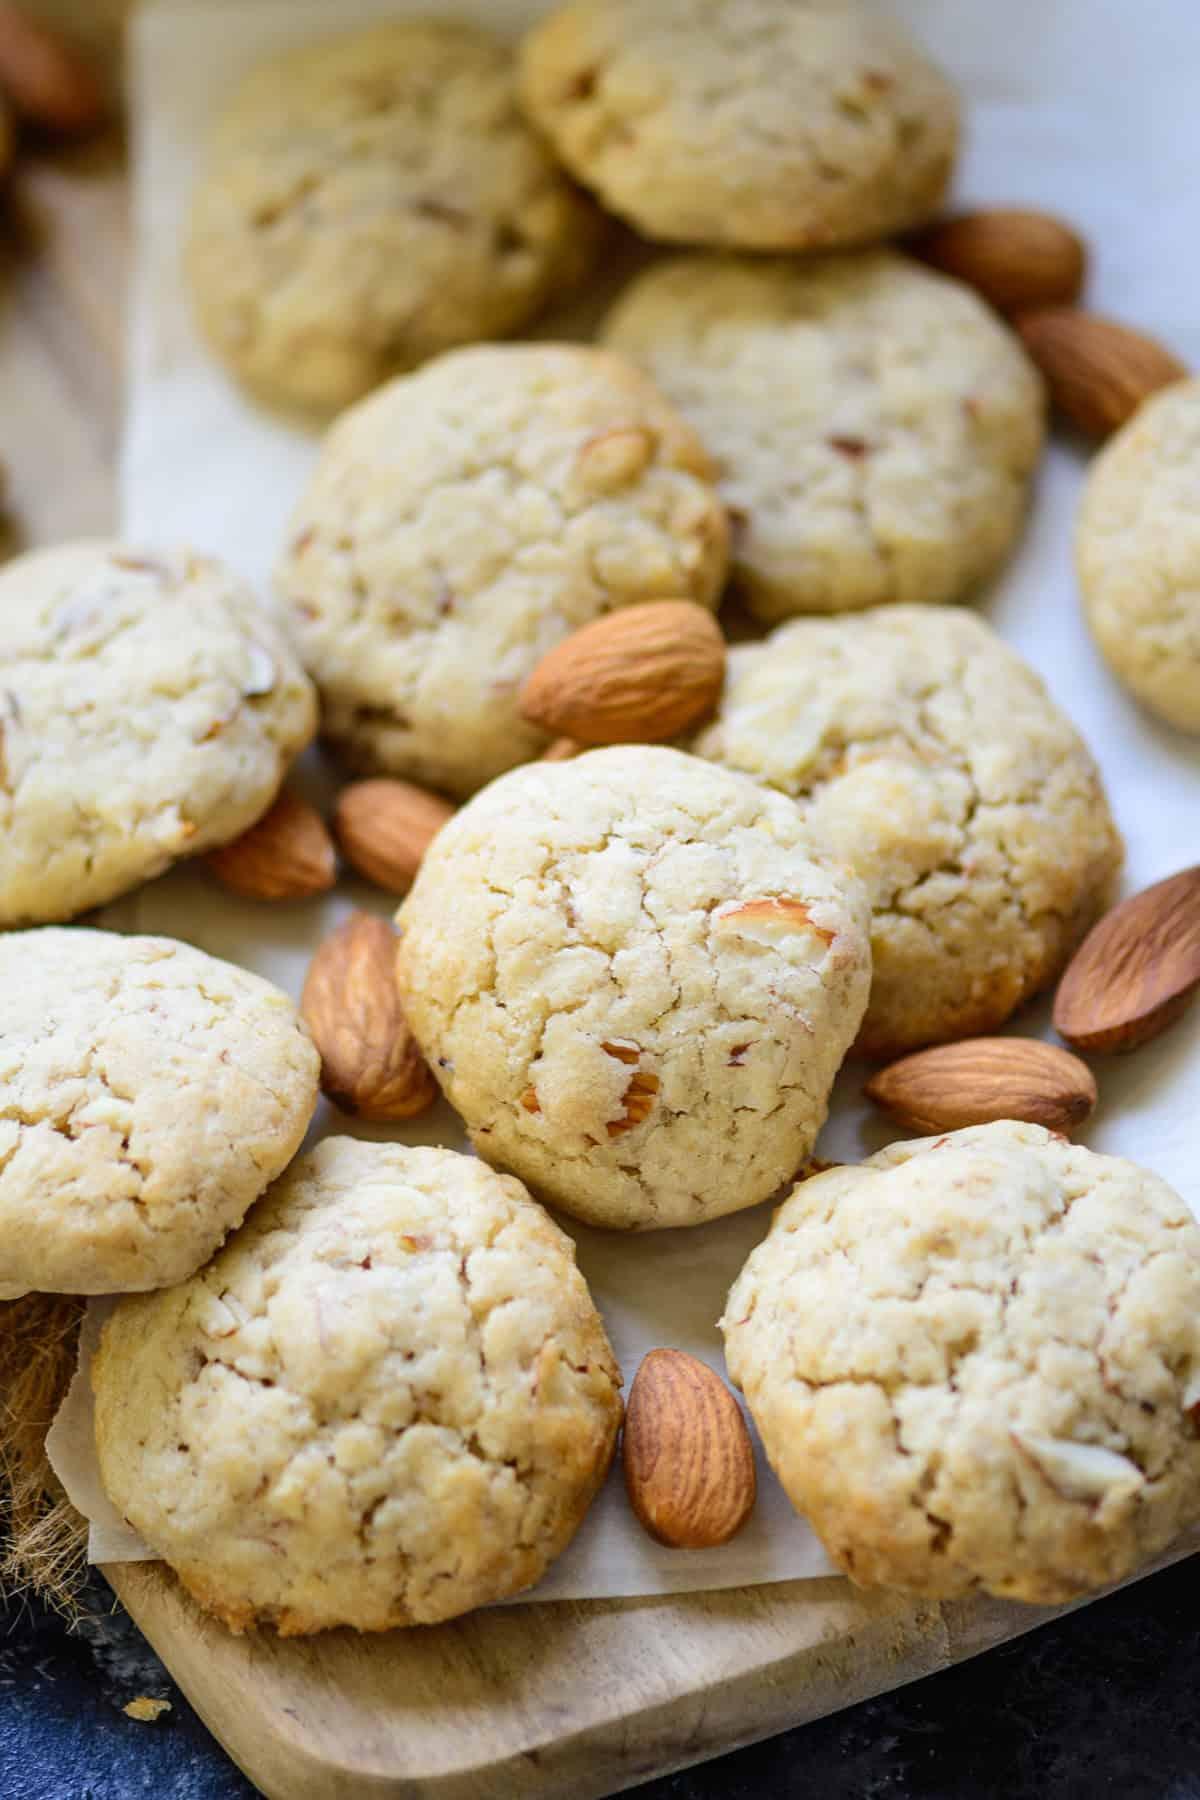 Crispy almond cookies.